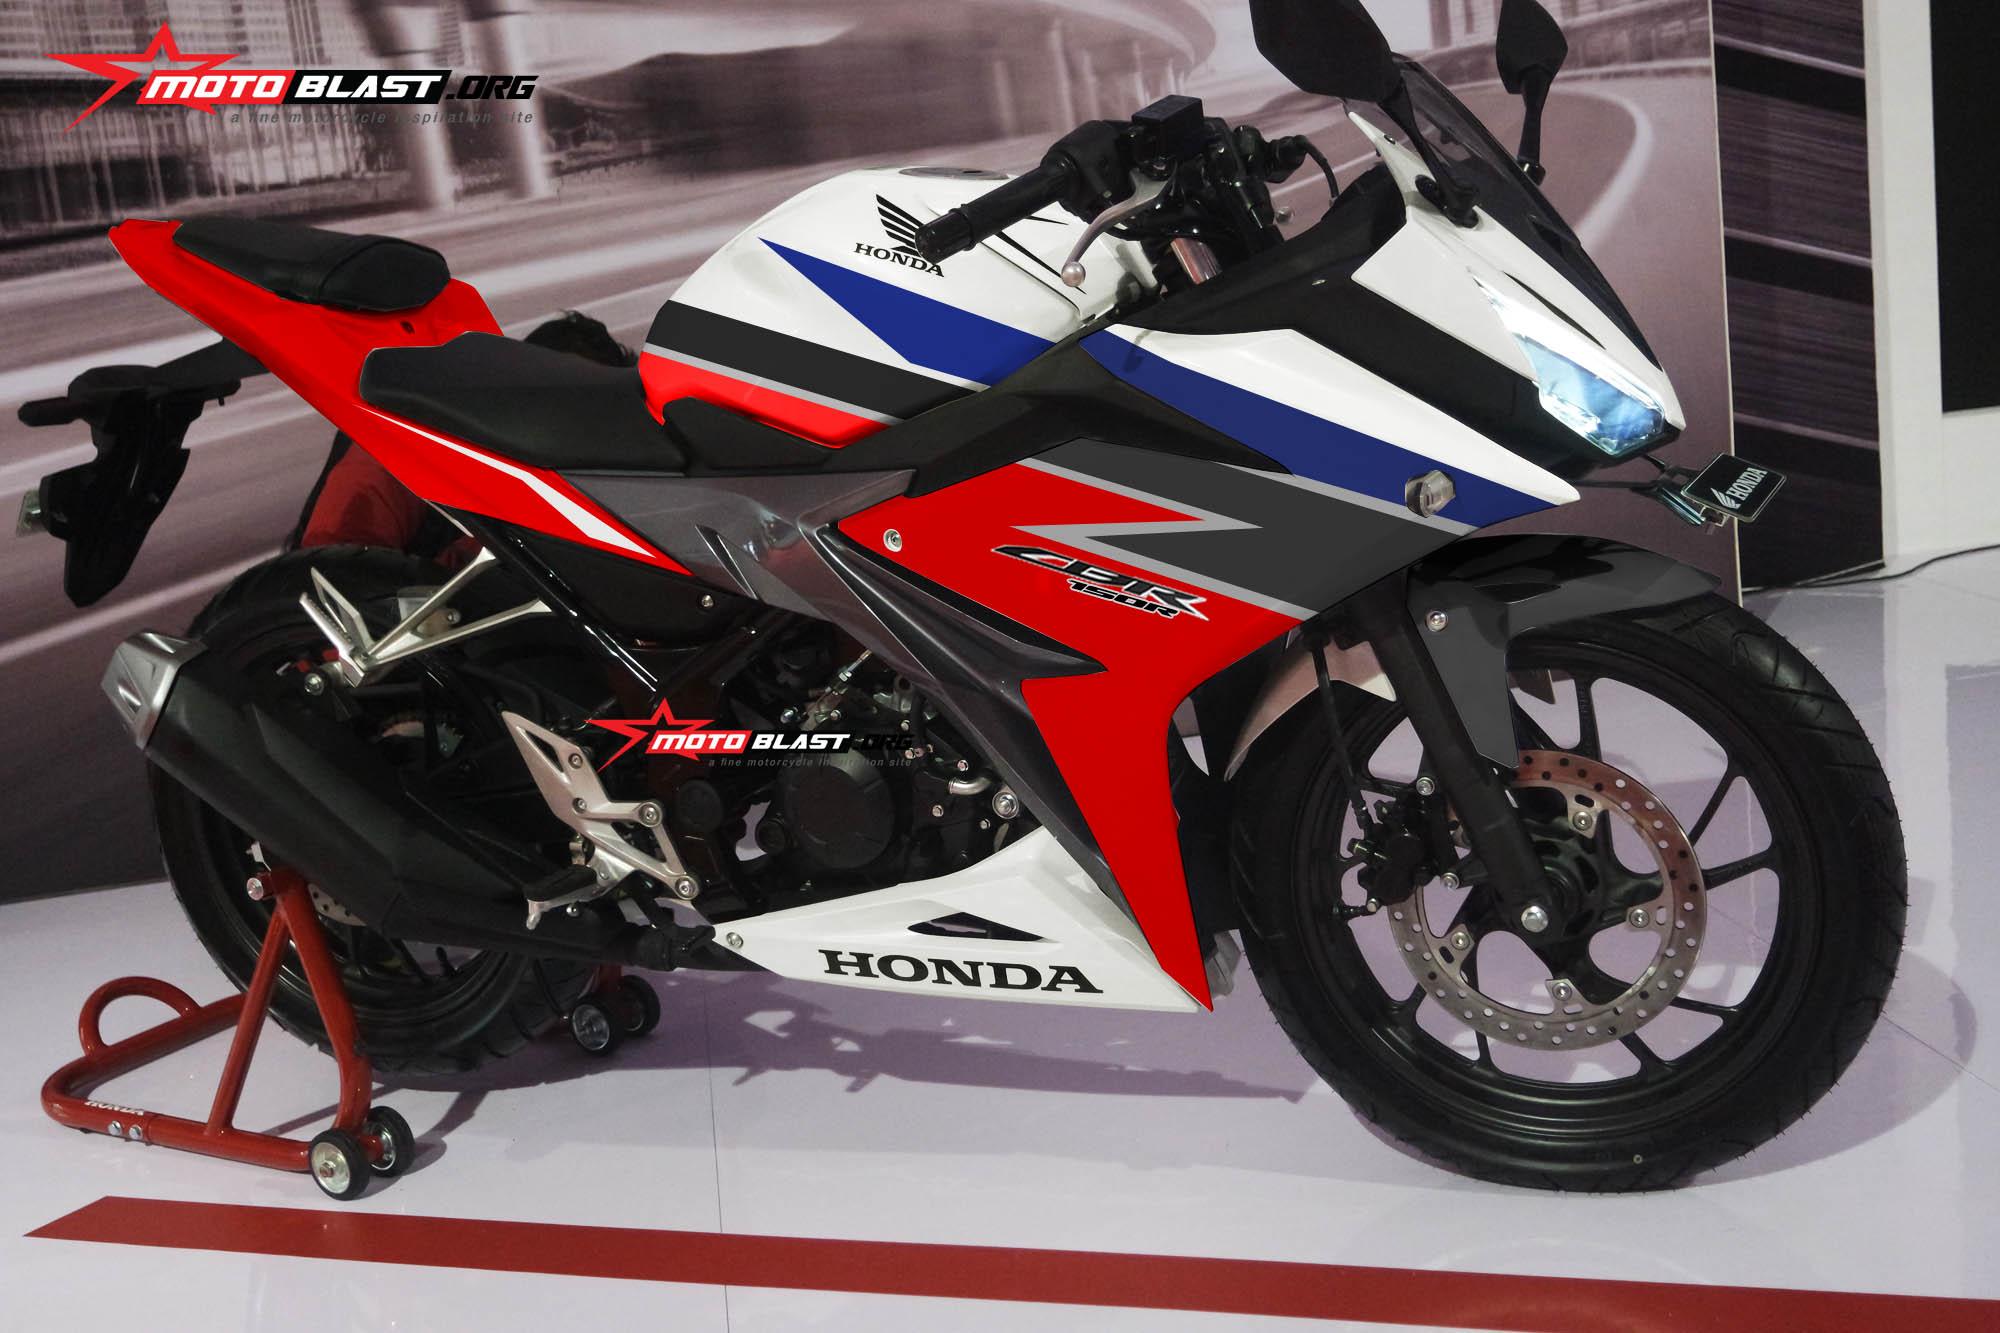 70 modifikasi motor cb 150 r facelift terlengkap | gudeg motor